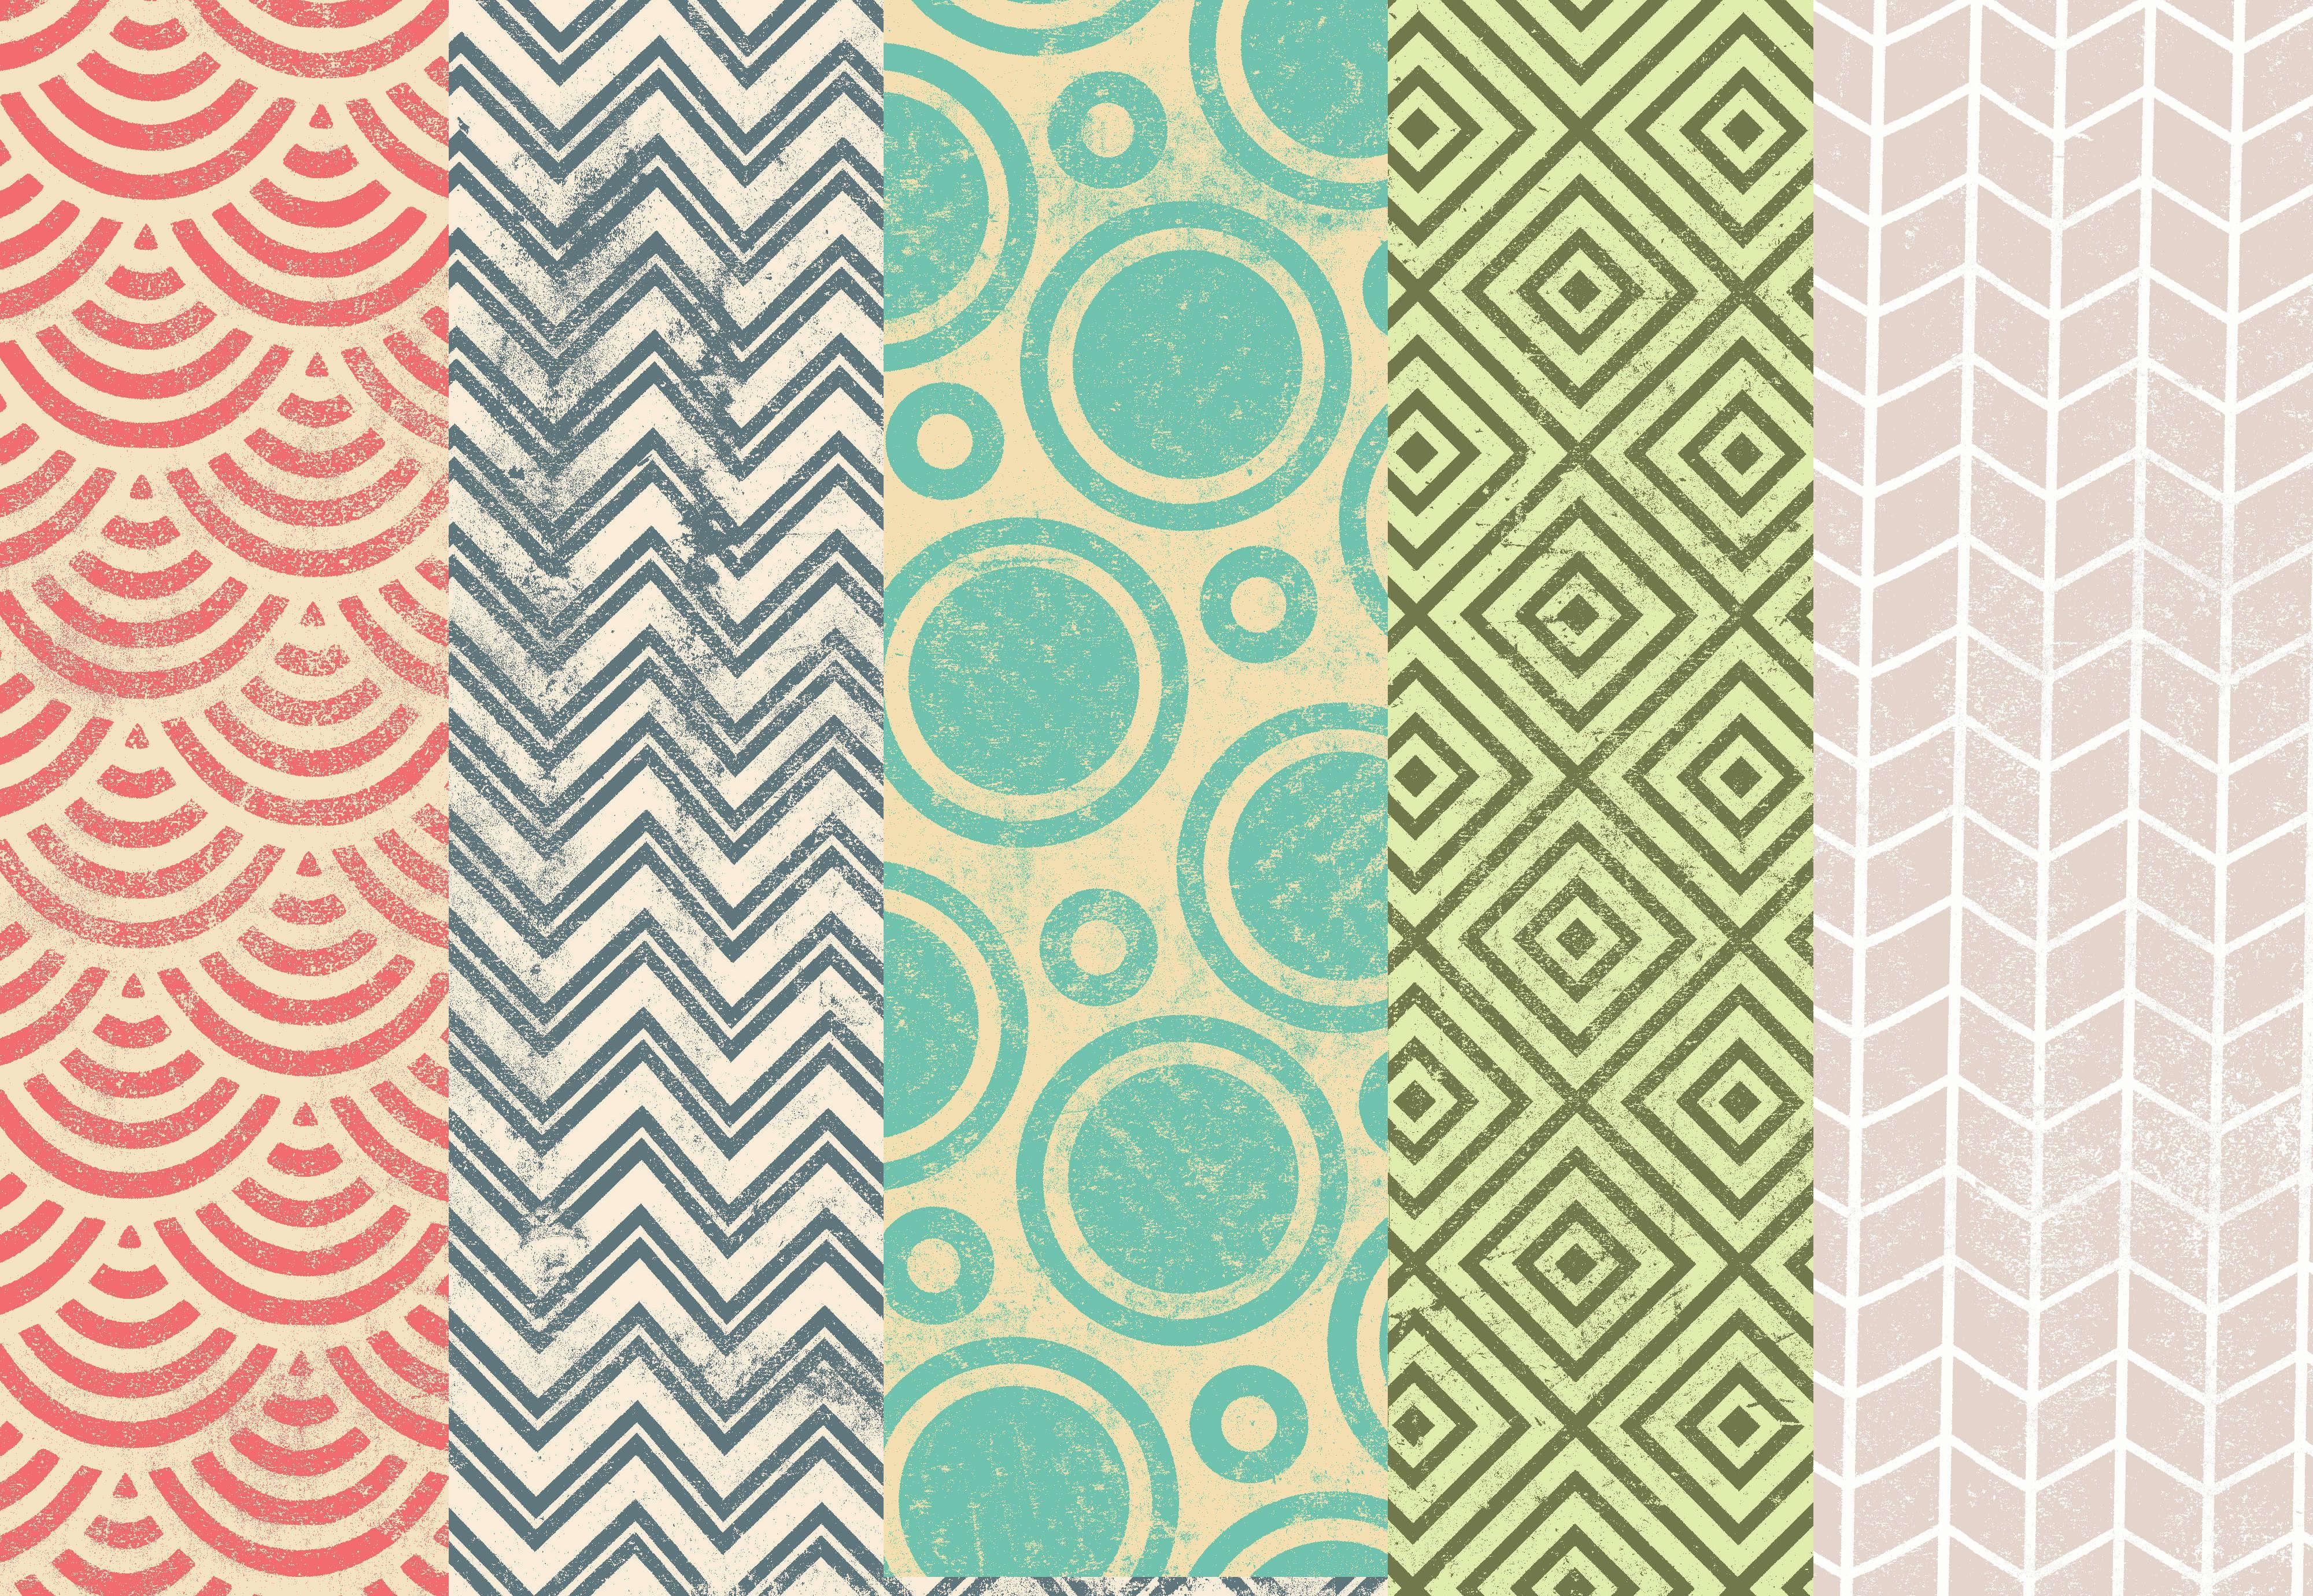 retro-grunge-pattern-background-cover.jpg